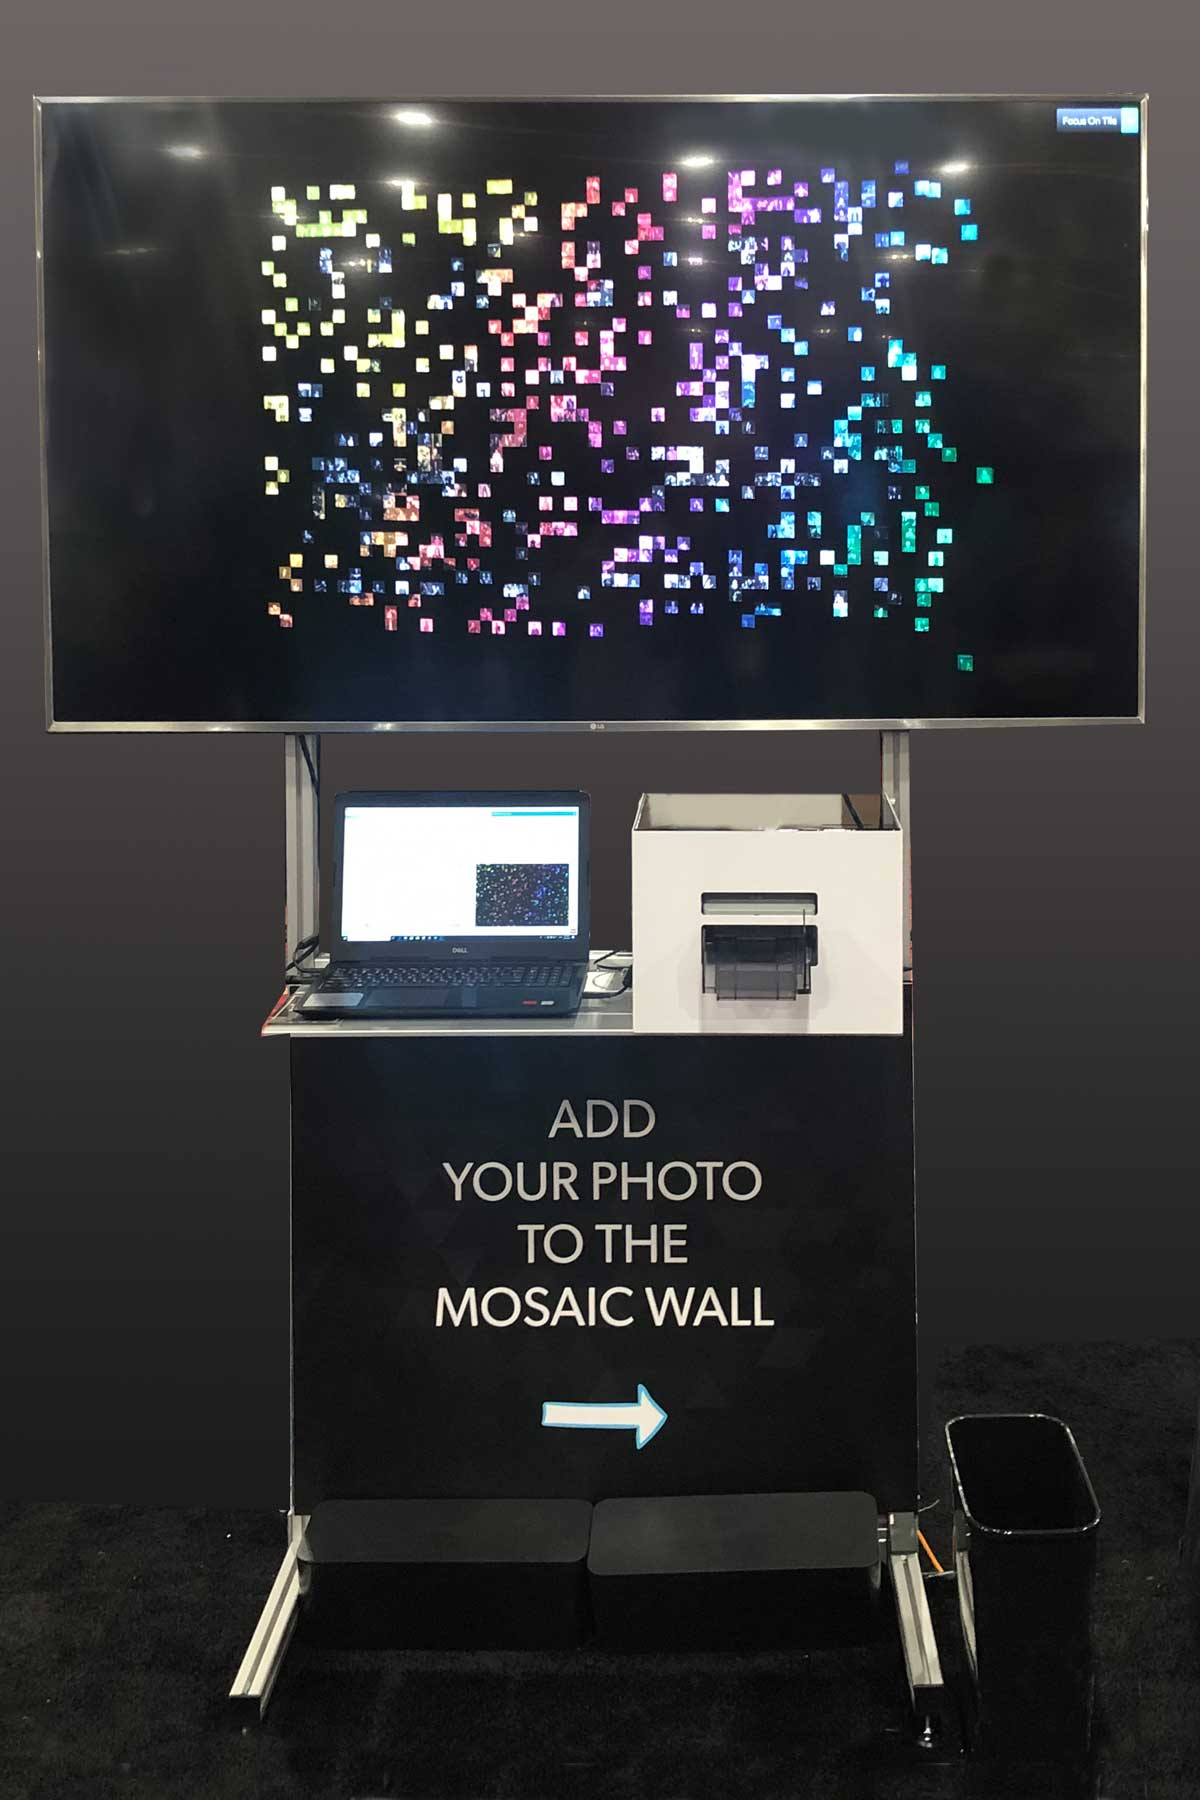 Mosaic-TV-DIsplay